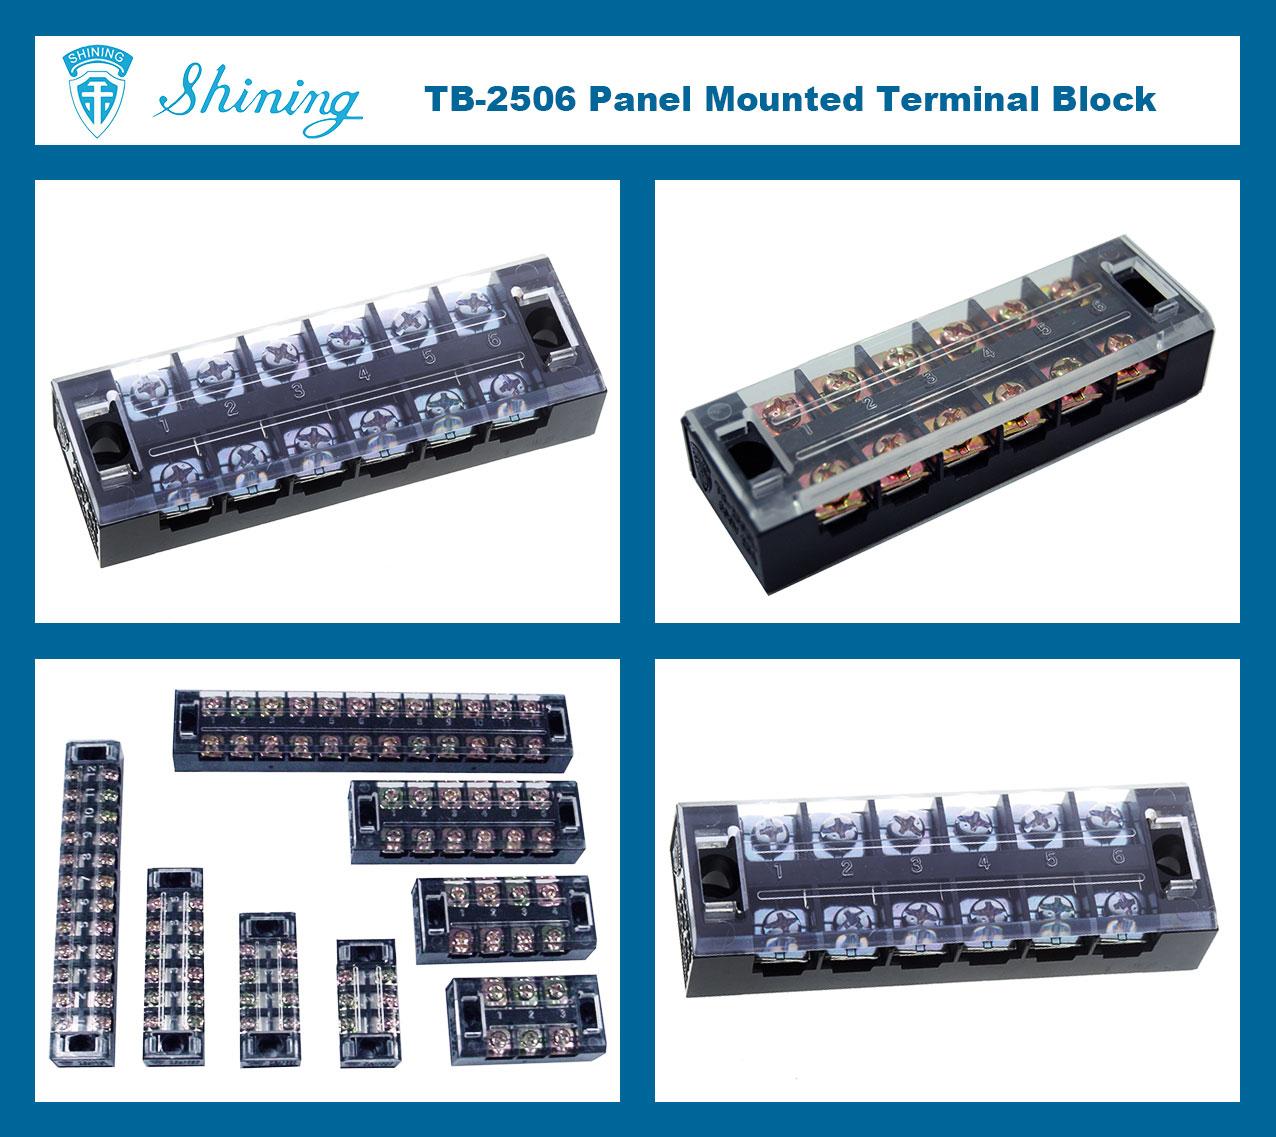 BLUE SEA 2506 TERMINAL BLOCK 6 CIRCUIT